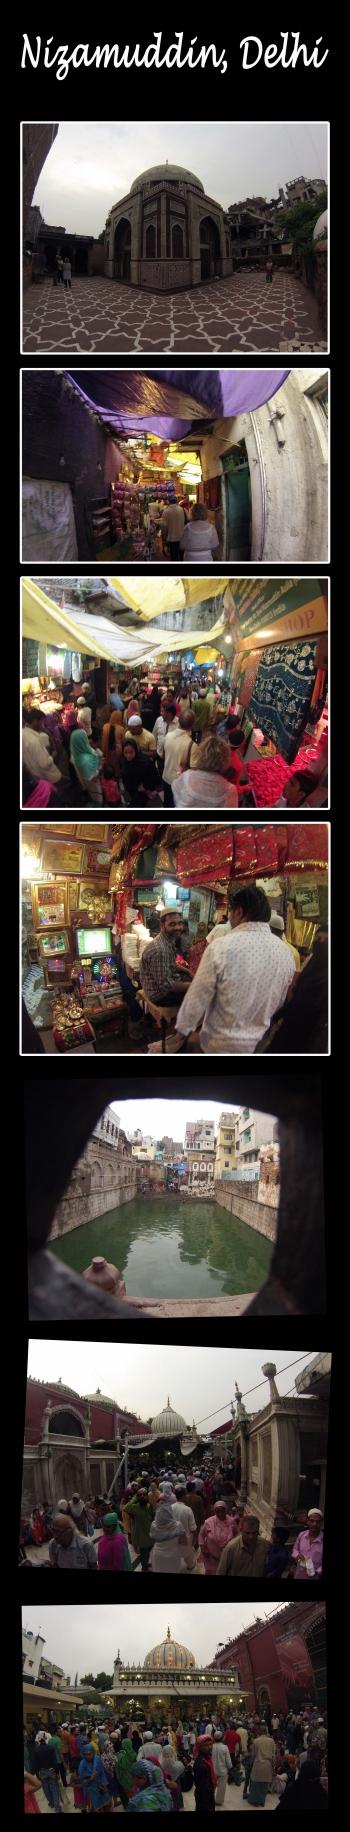 Inde,Delhi,Nizamuddin,soufi,chants soufis